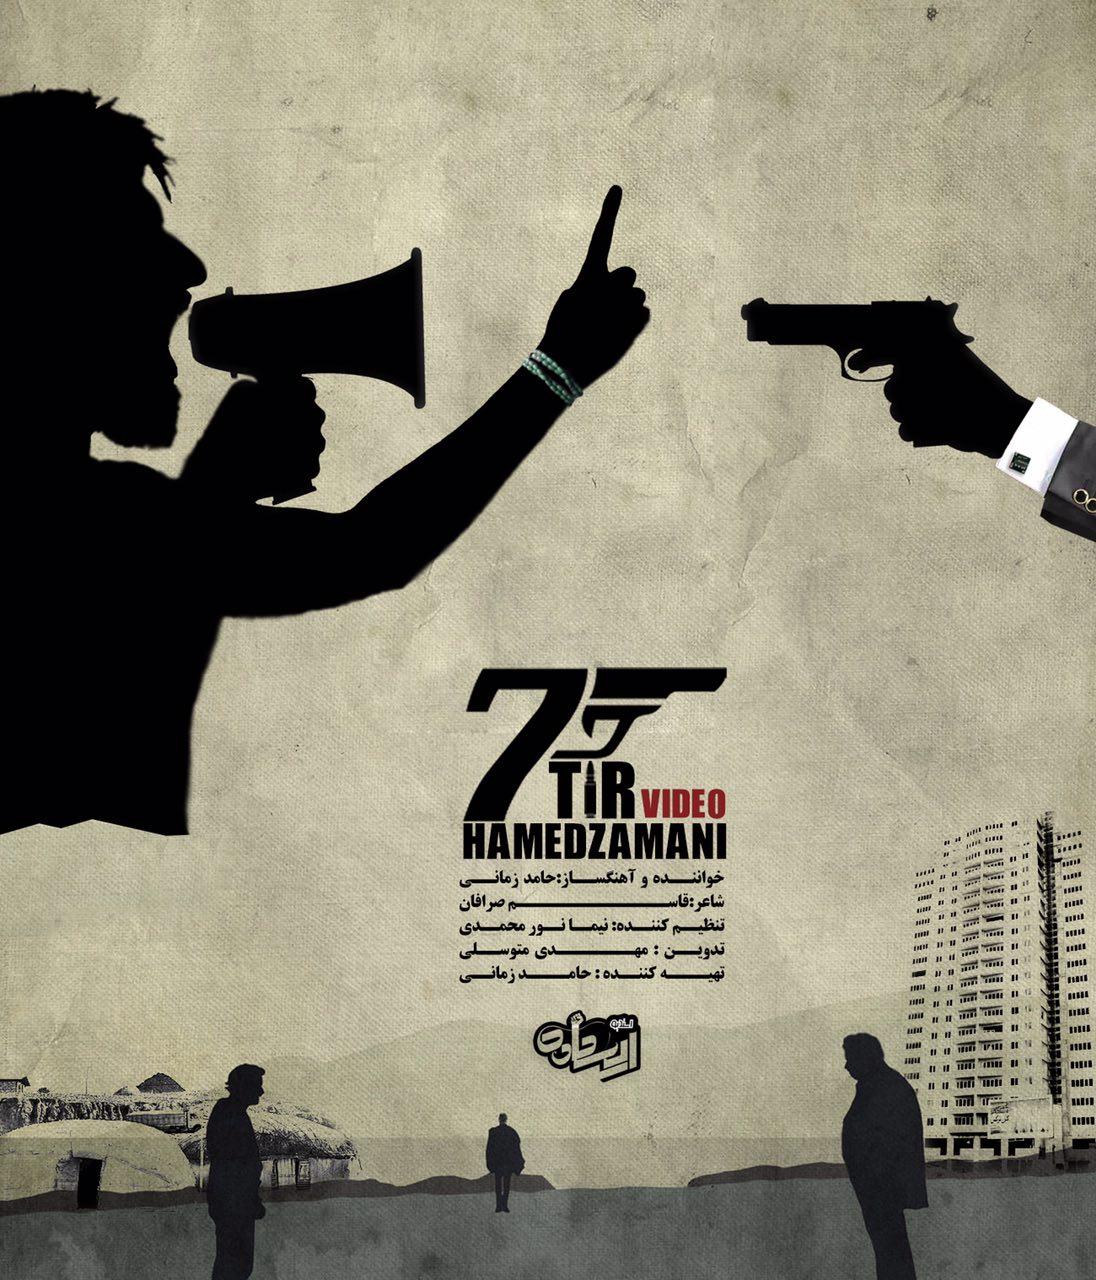 Hamed Zamani – 7Tir